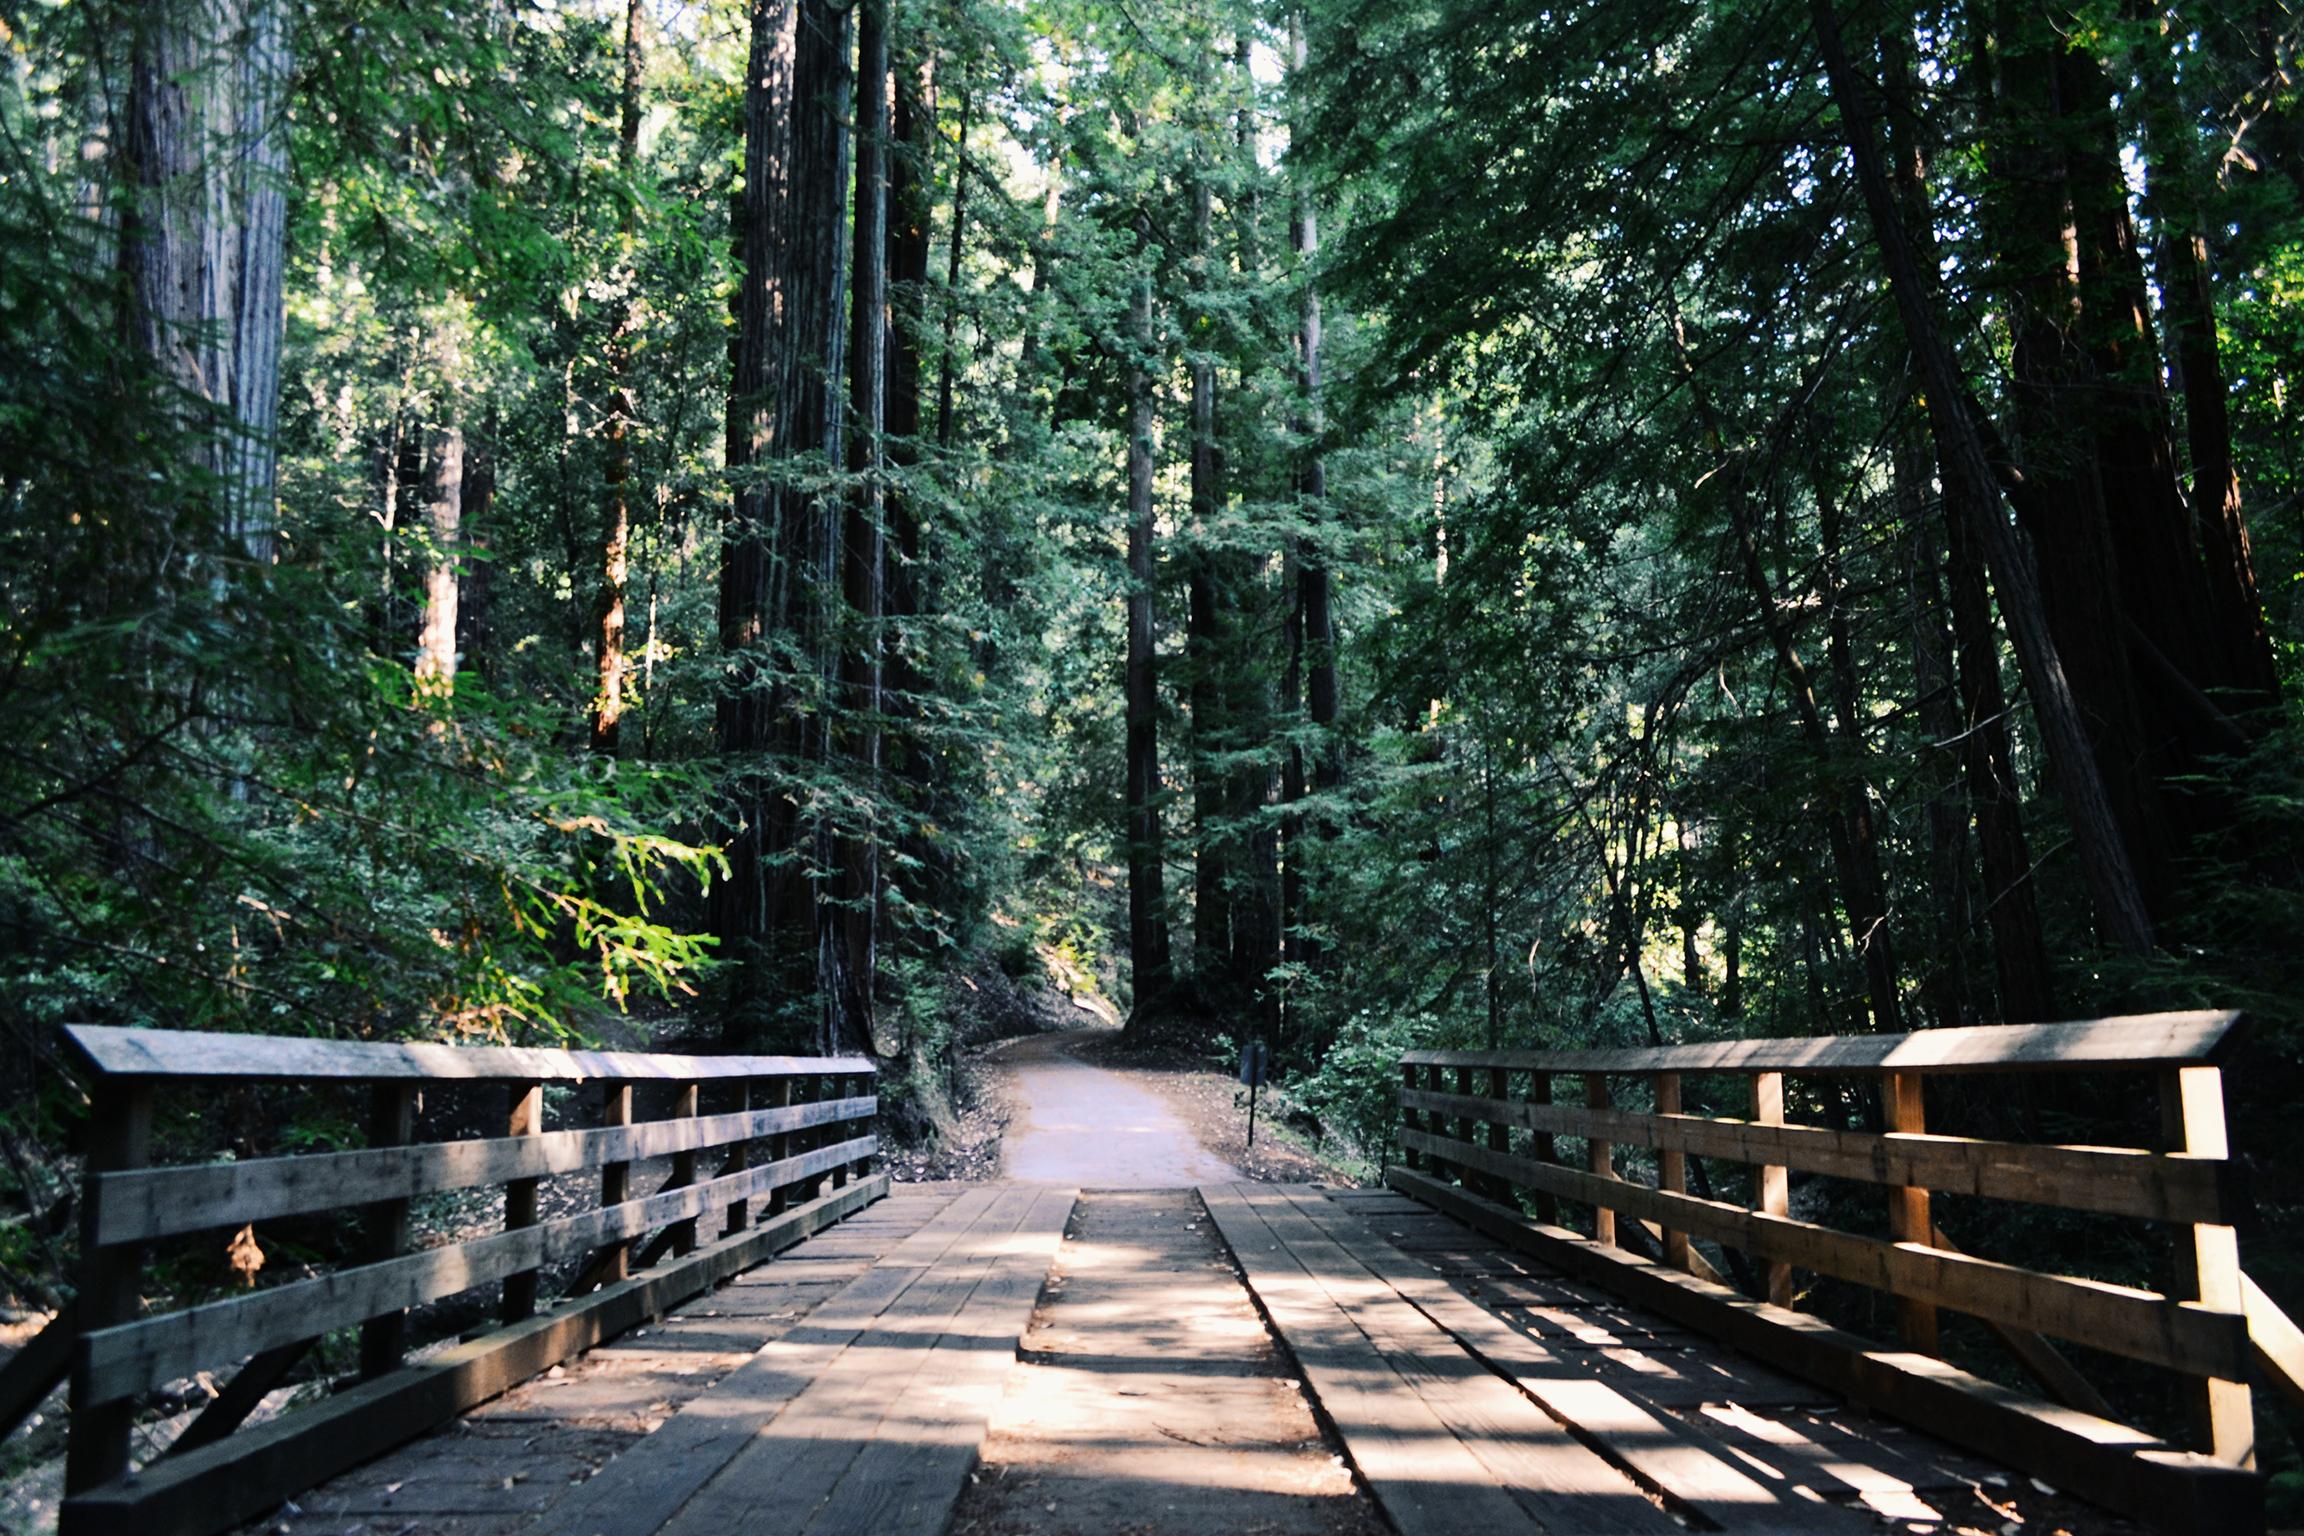 bridge path amongst redwoods and firs on Mount Tamalpais